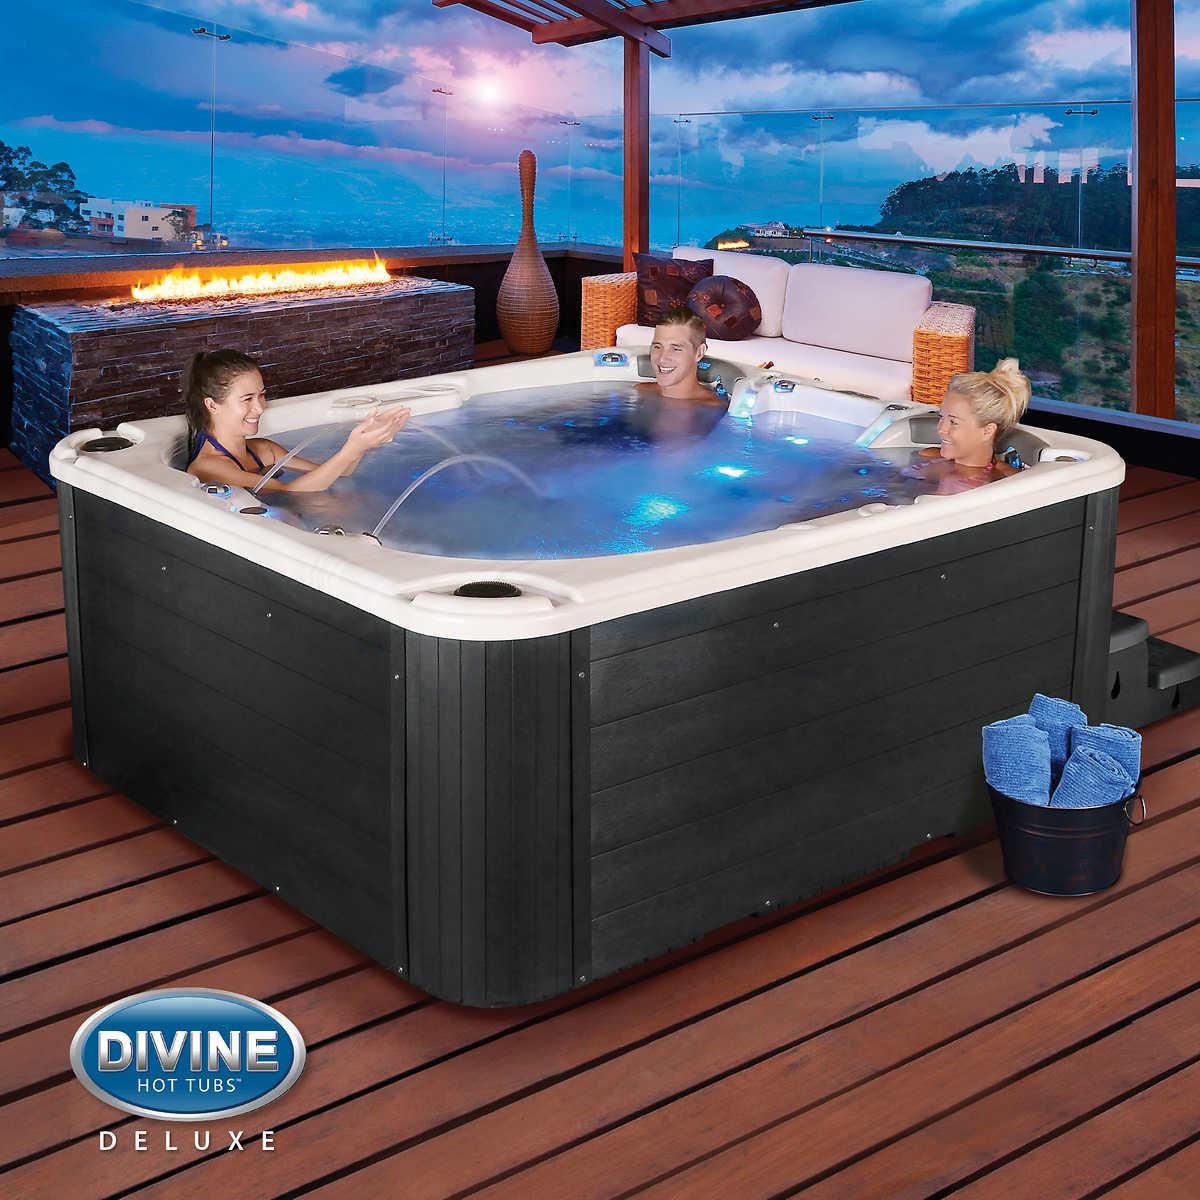 Divine Hot Tubs Portage 100-jet, 4-person Spa